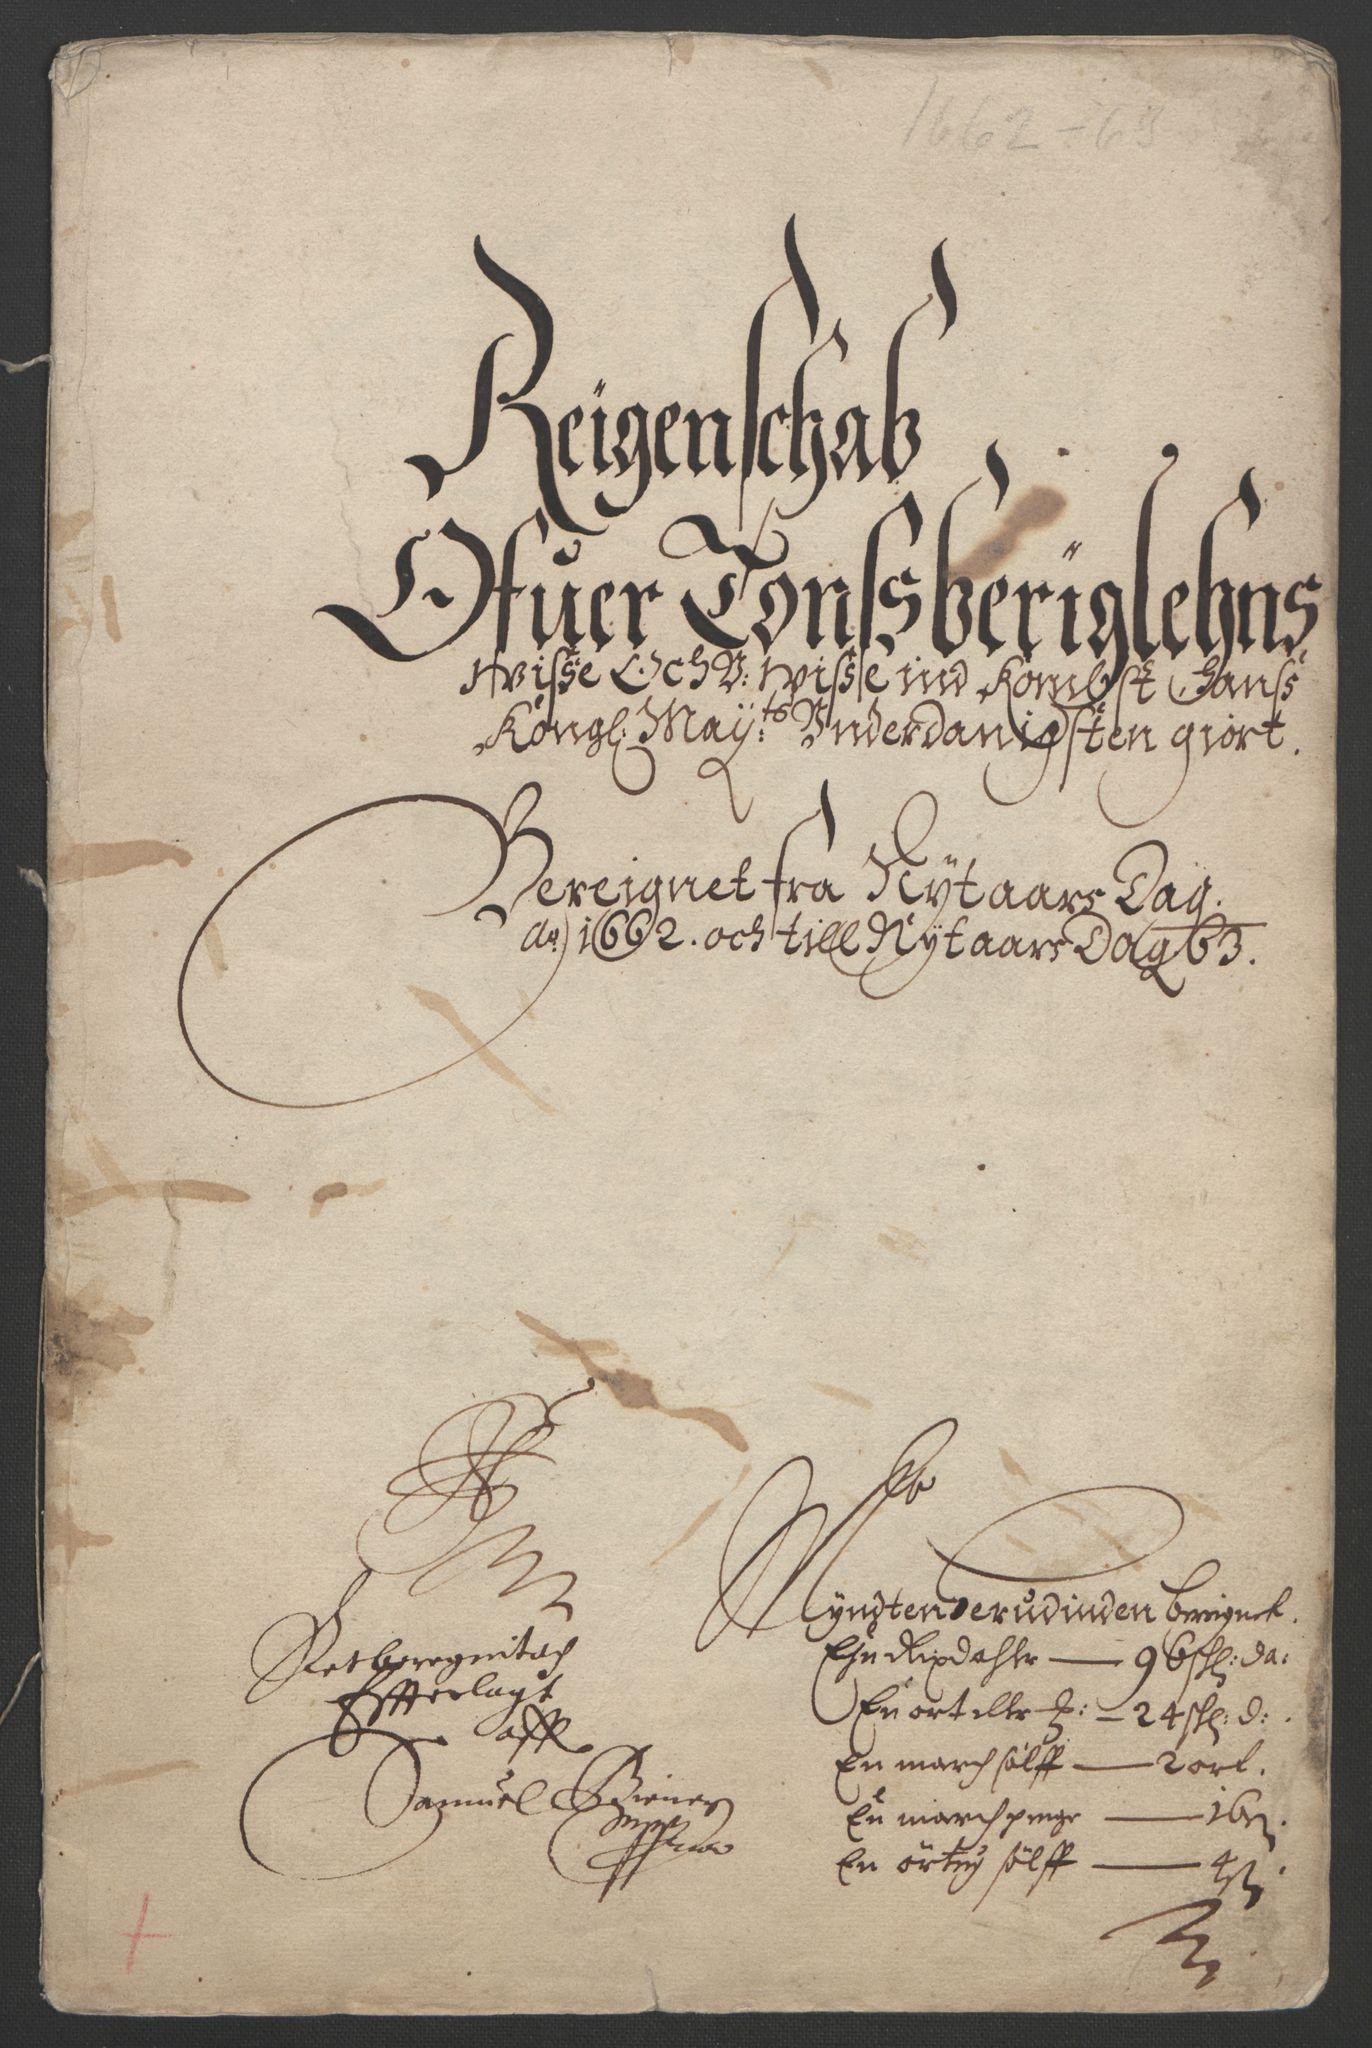 RA, Rentekammeret inntil 1814, Reviderte regnskaper, Fogderegnskap, R32/L1838: Fogderegnskap Jarlsberg grevskap, 1661-1663, s. 143